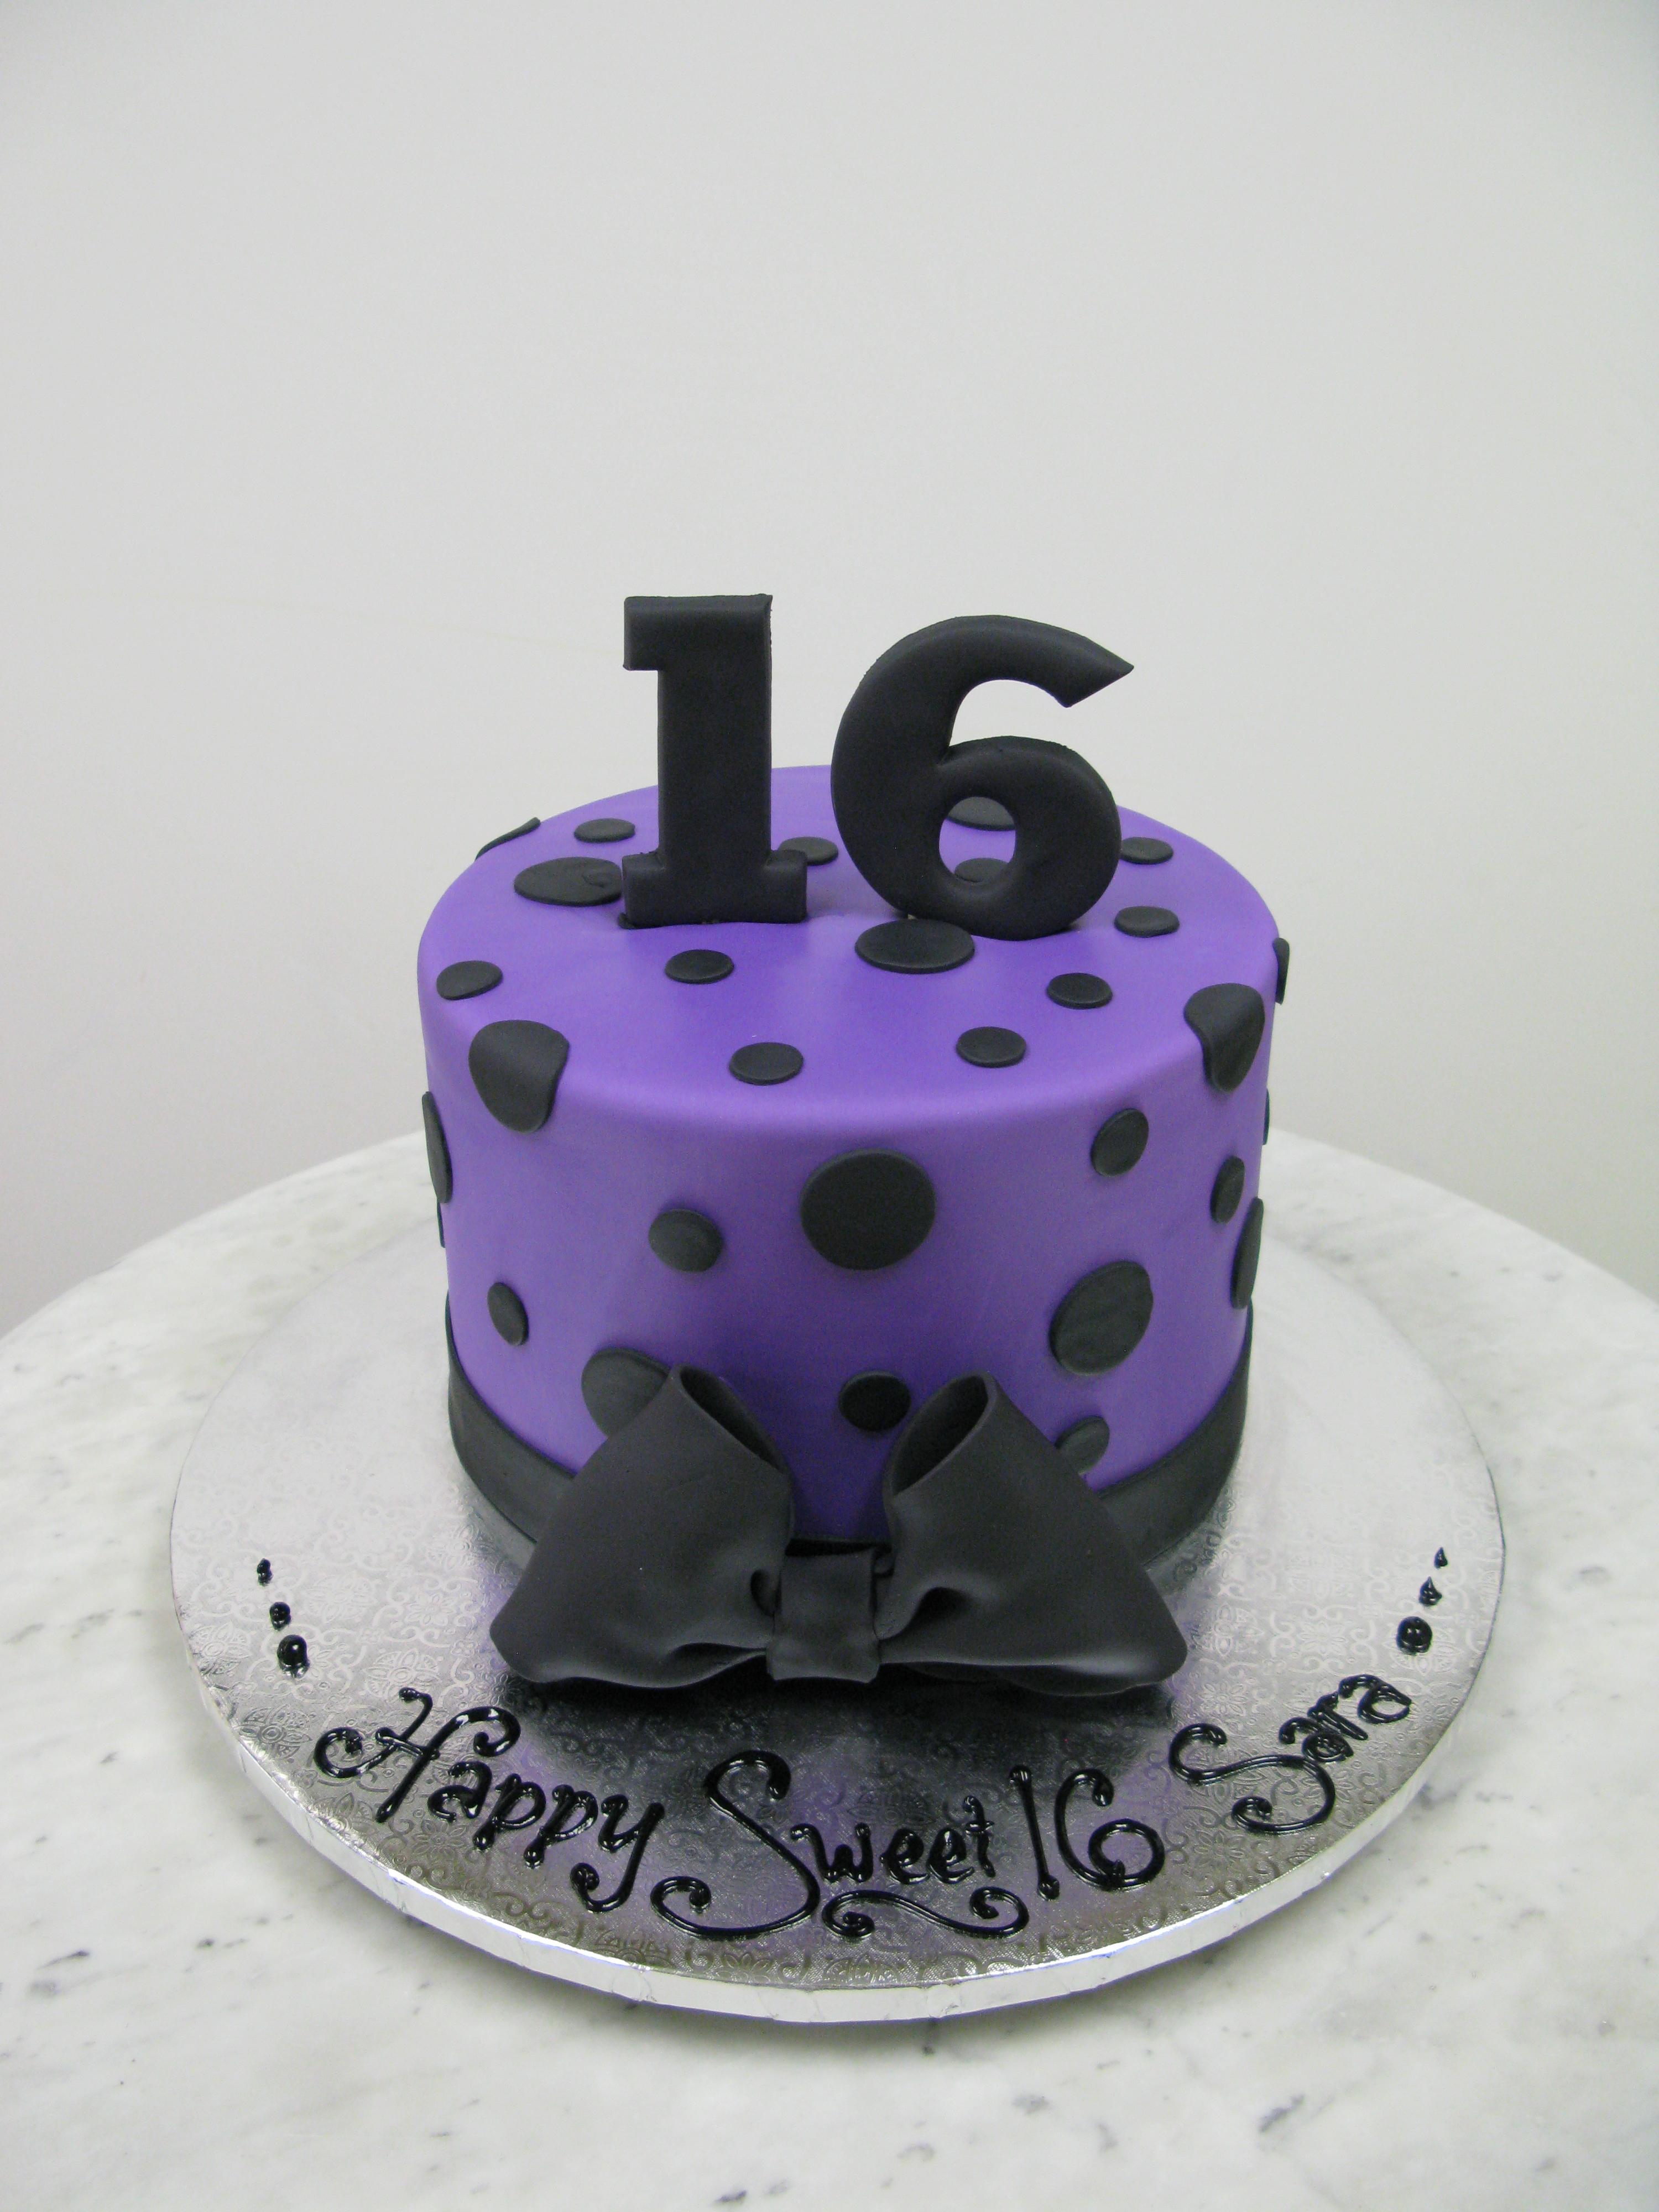 Simply Sweet 16